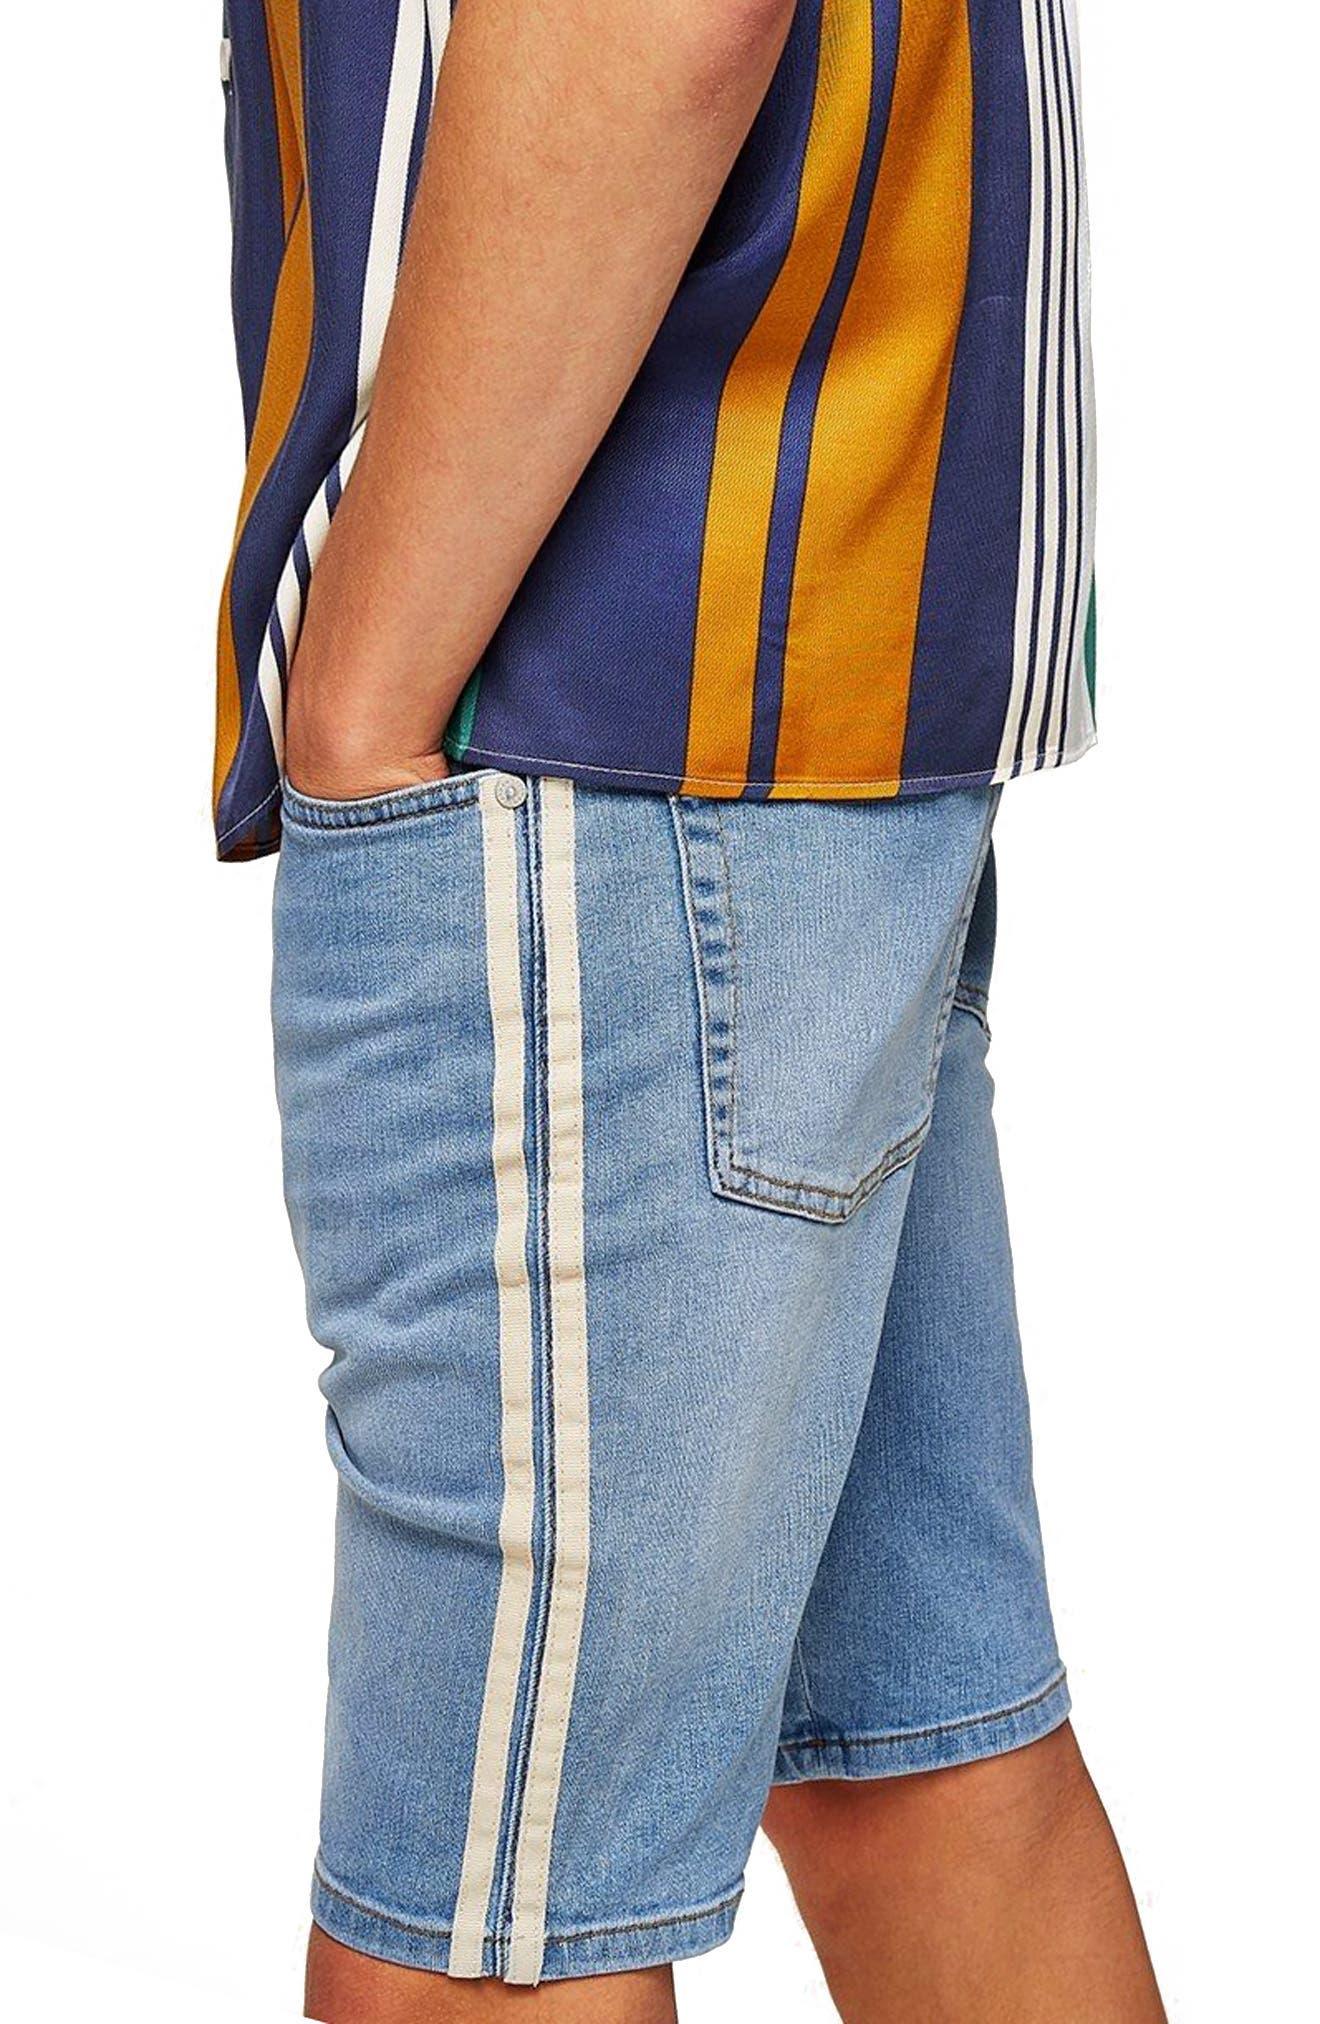 Tape Stretch Skinny Fit Denim Shorts,                             Alternate thumbnail 2, color,                             Blue